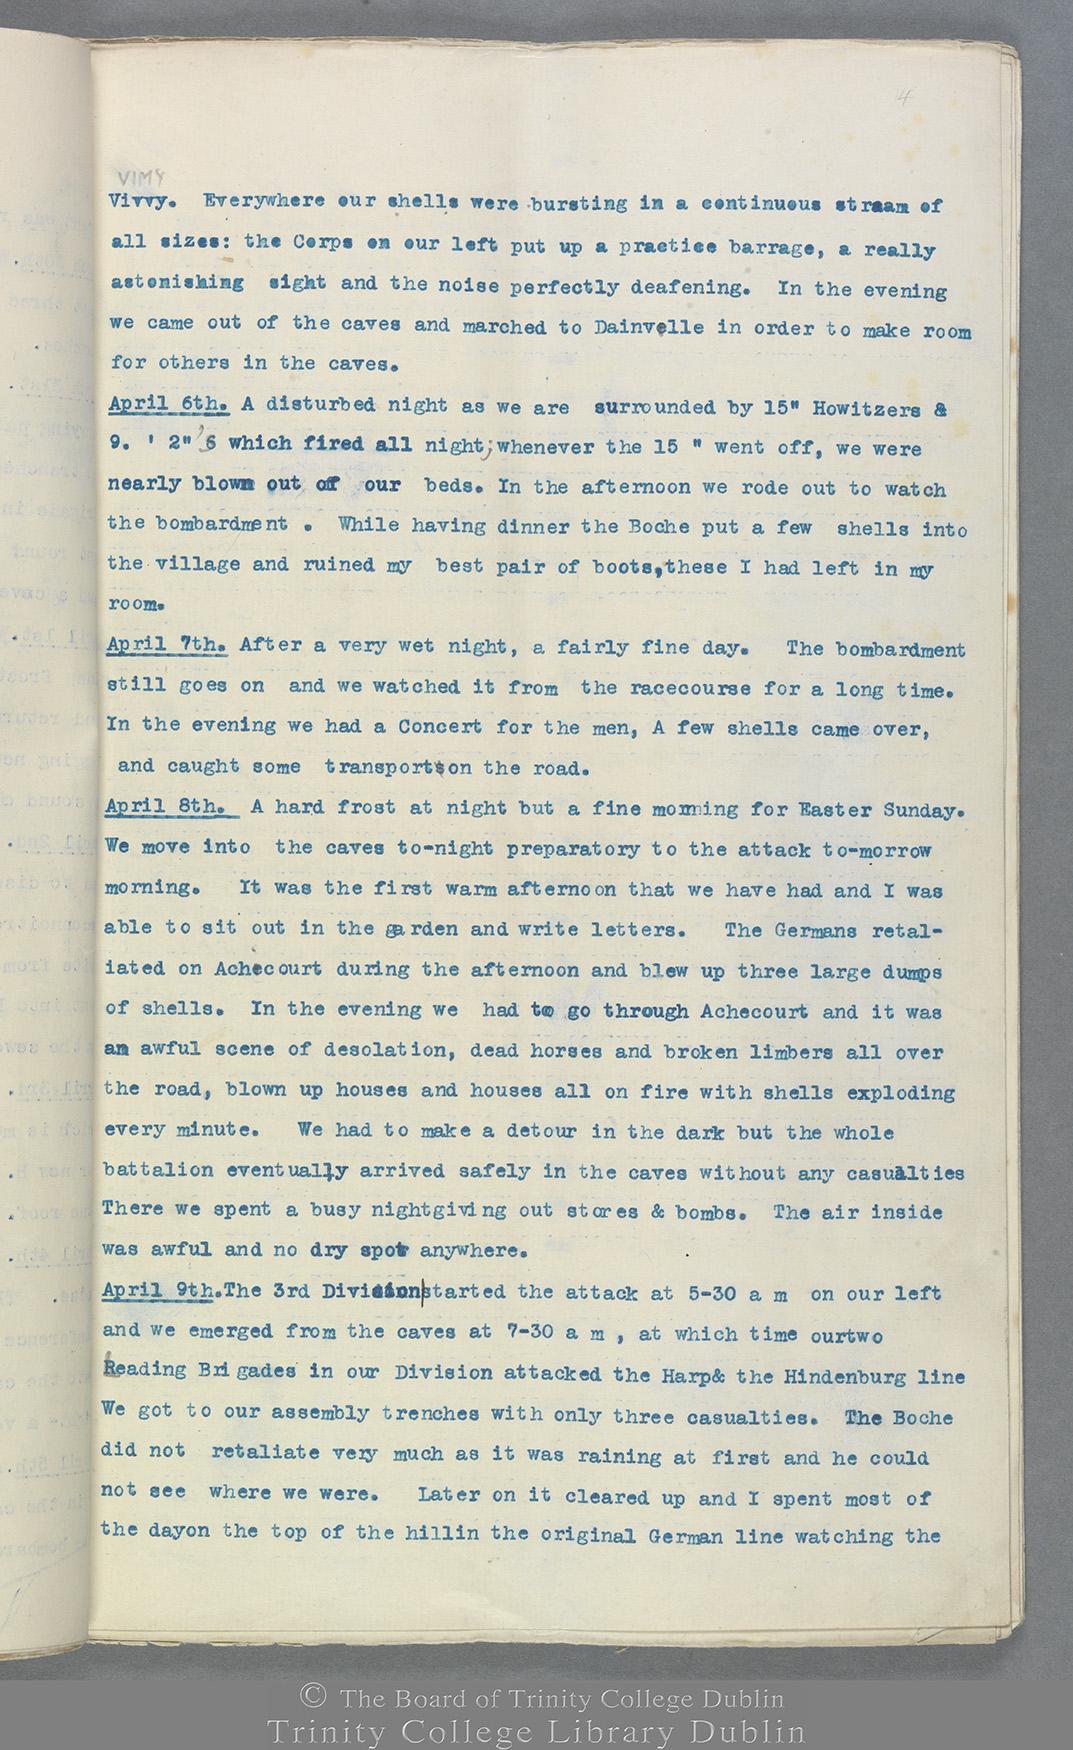 TCD MS 10822 folio 14 recto